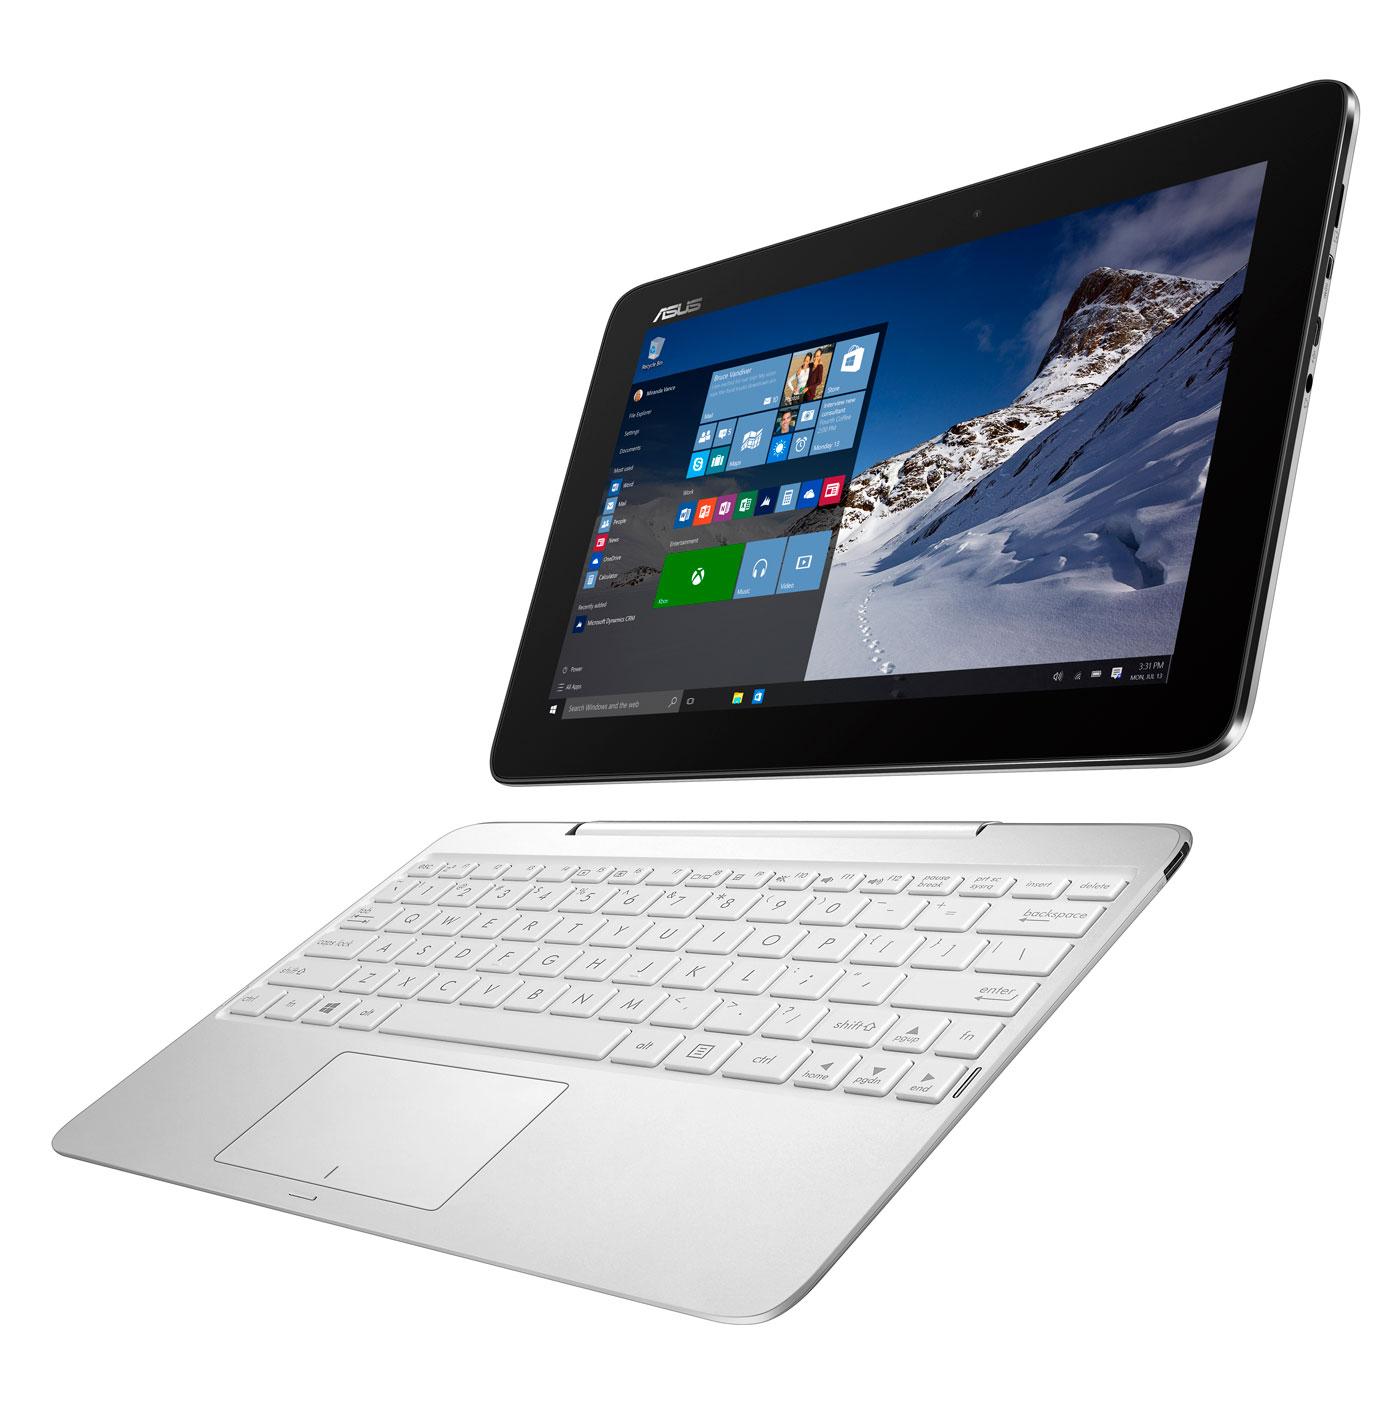 ASUS T100HA 10.1T/Z8500/64GB/4G/Win 10, bílý